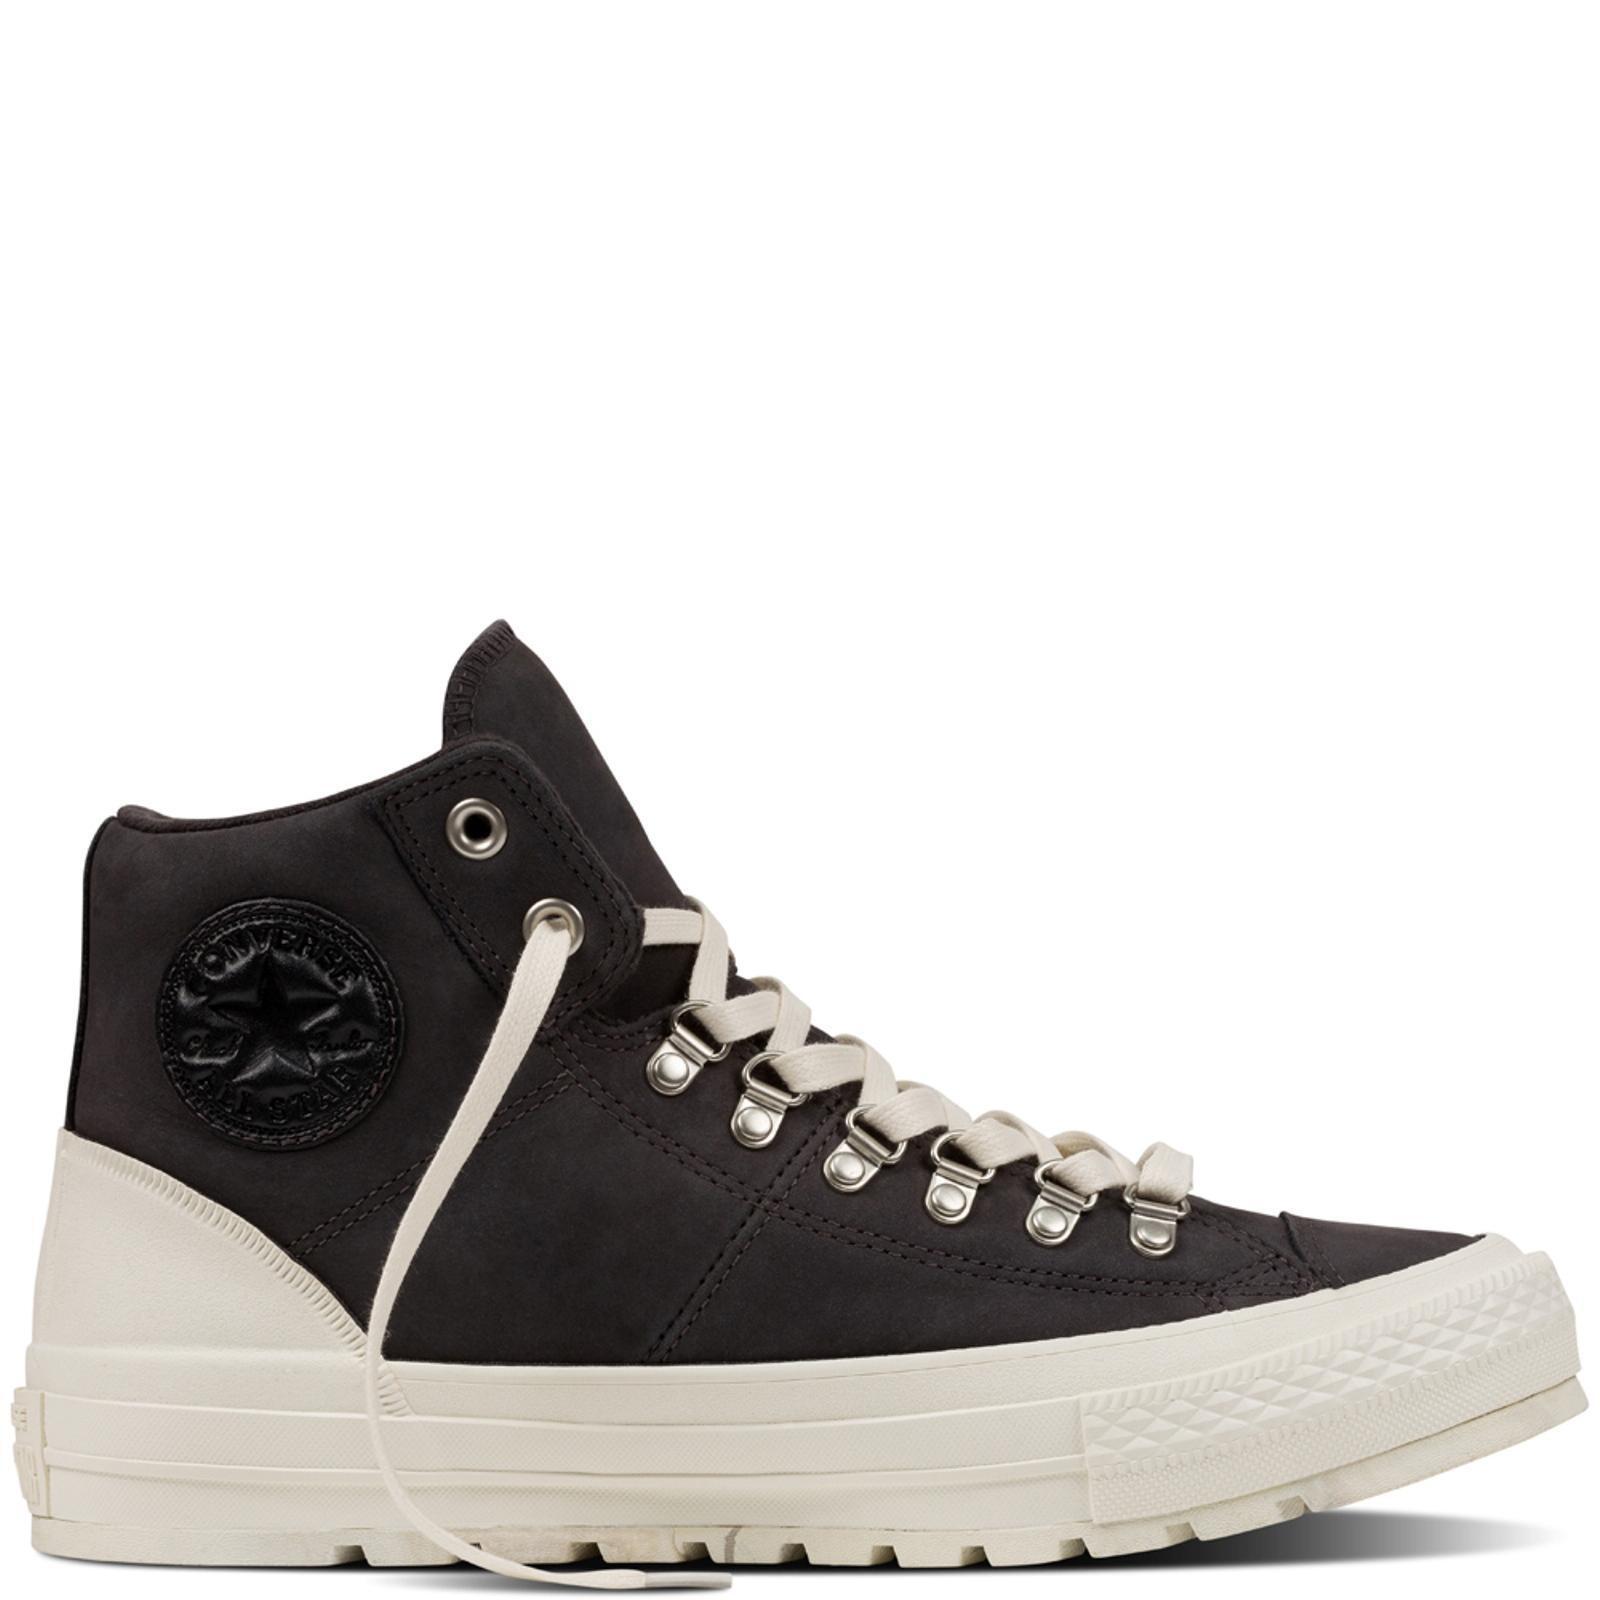 CONVERSE Chuck Taylor All Star Street Hiker Zapatillas EU 38.5 scarpe Aut/Inv.